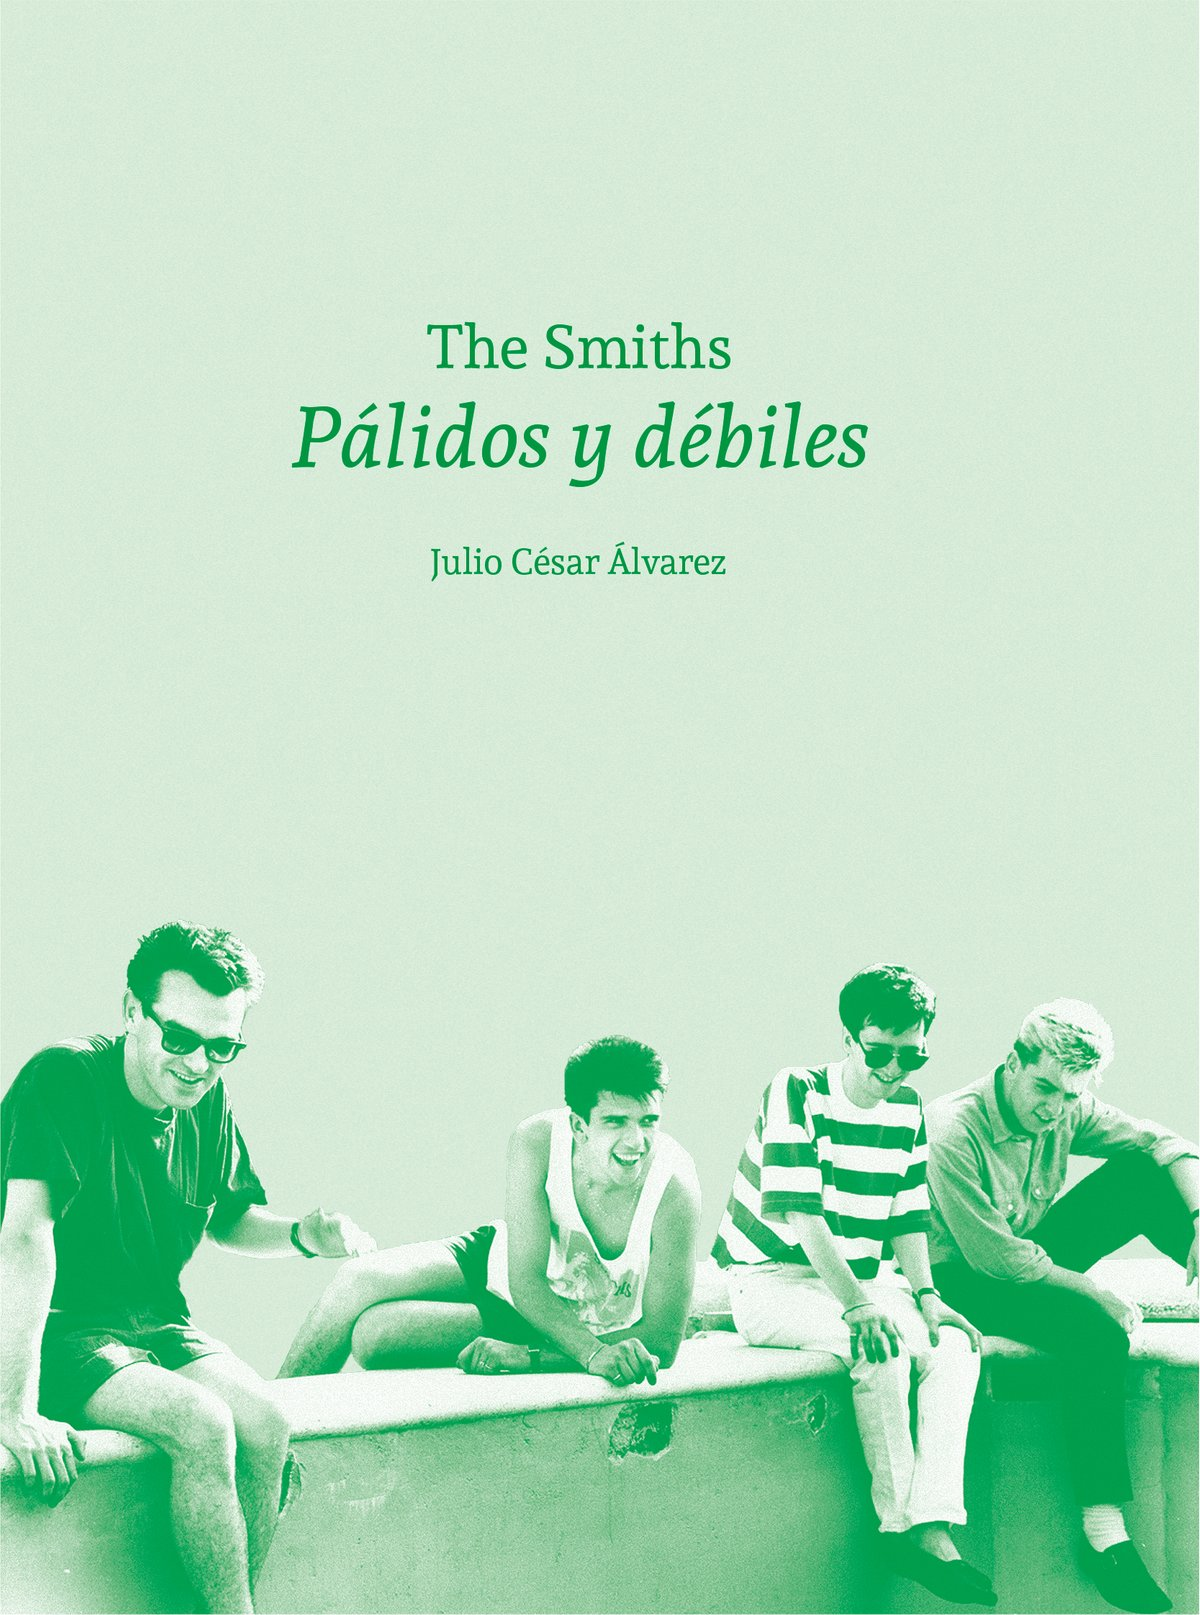 Julio César Álvarez - The Smiths. Pálidos y débiles